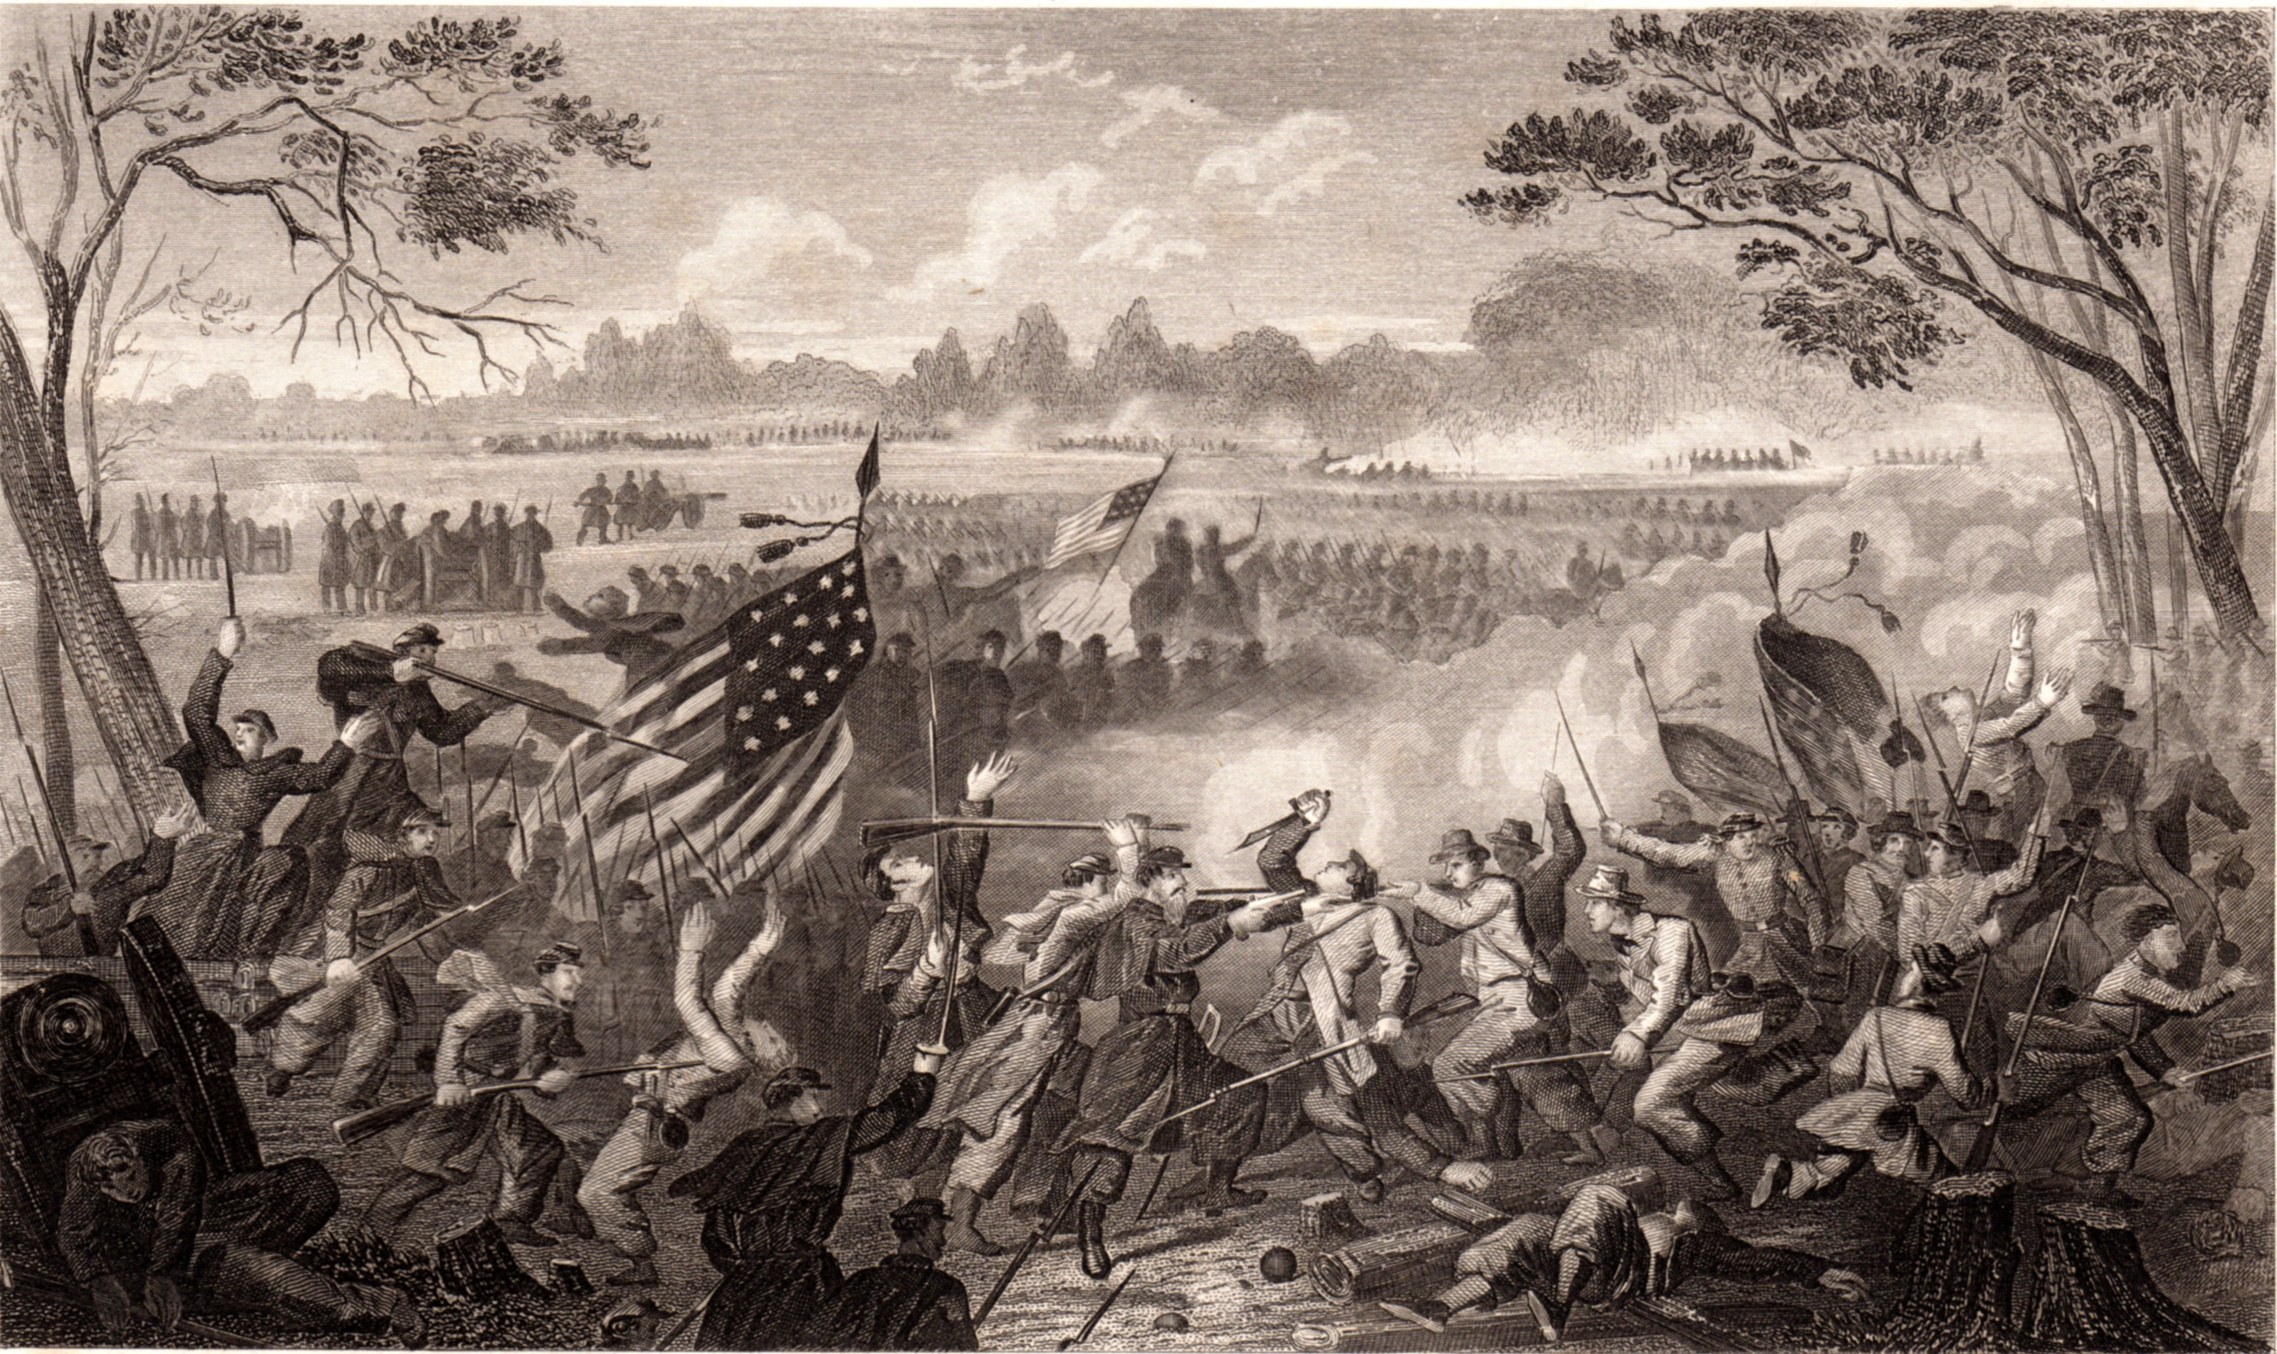 US Civil War scenes and portraits